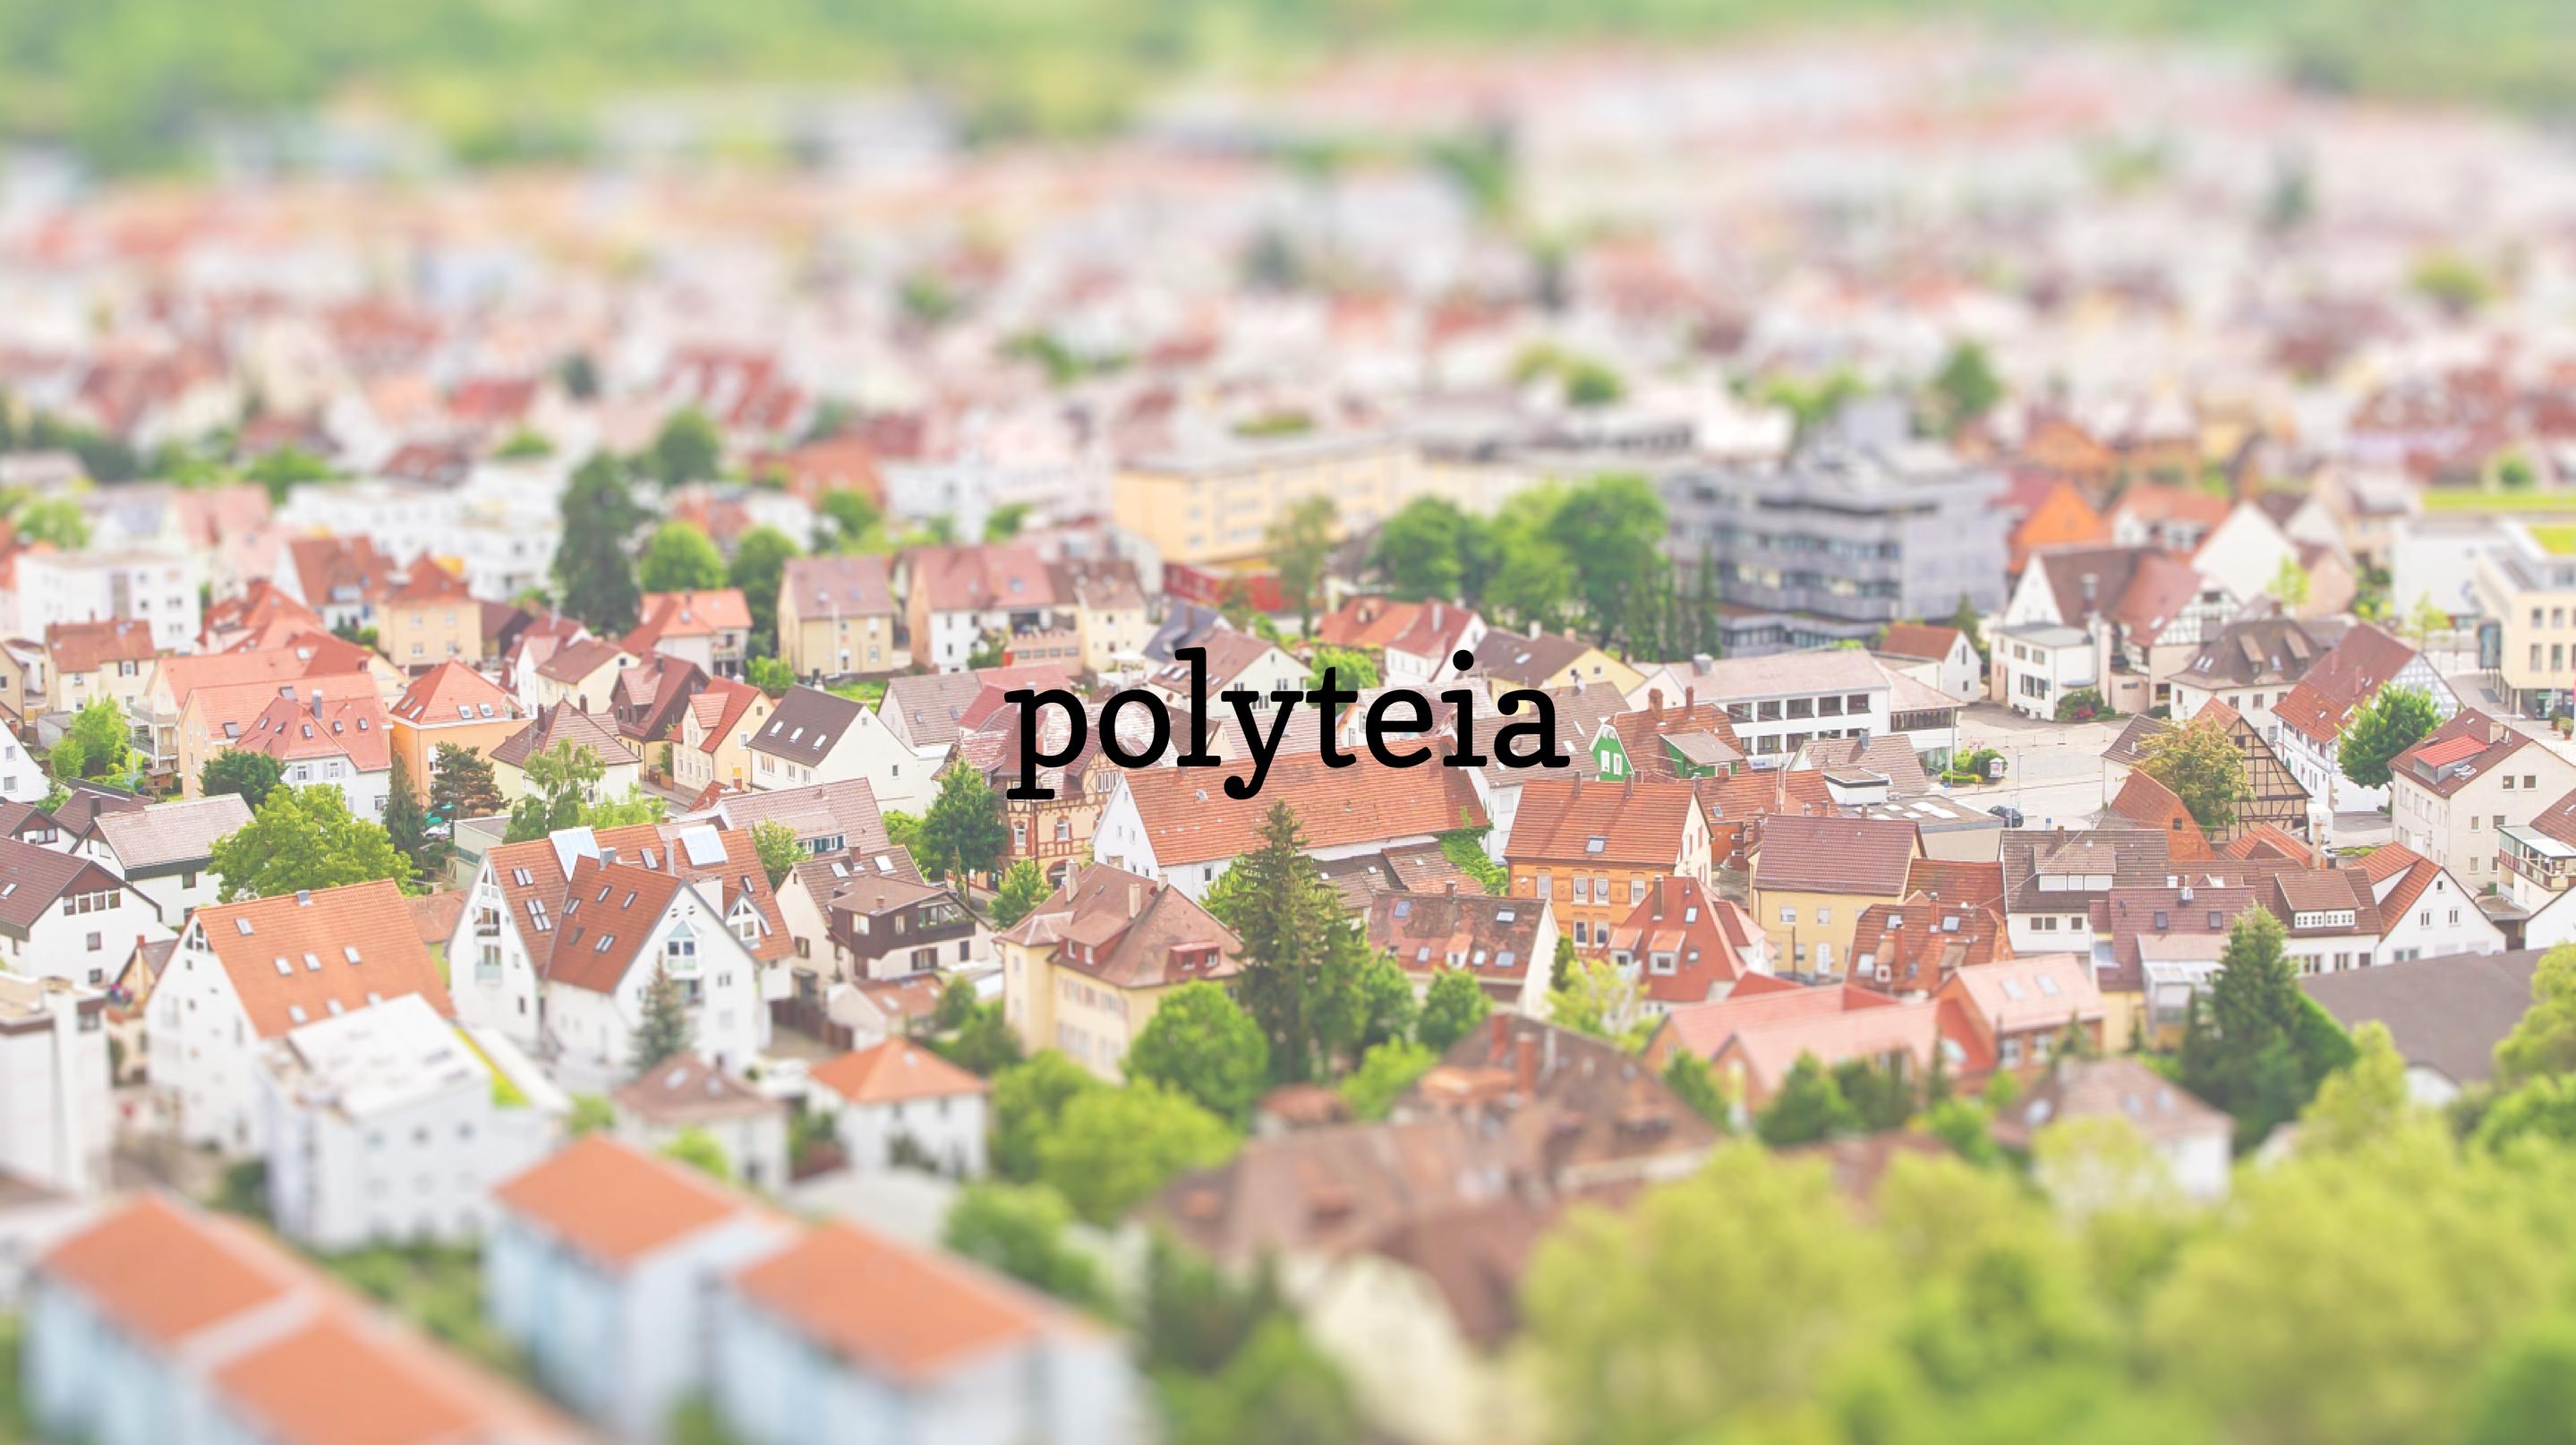 Polyteia uses Circula, a Case Study